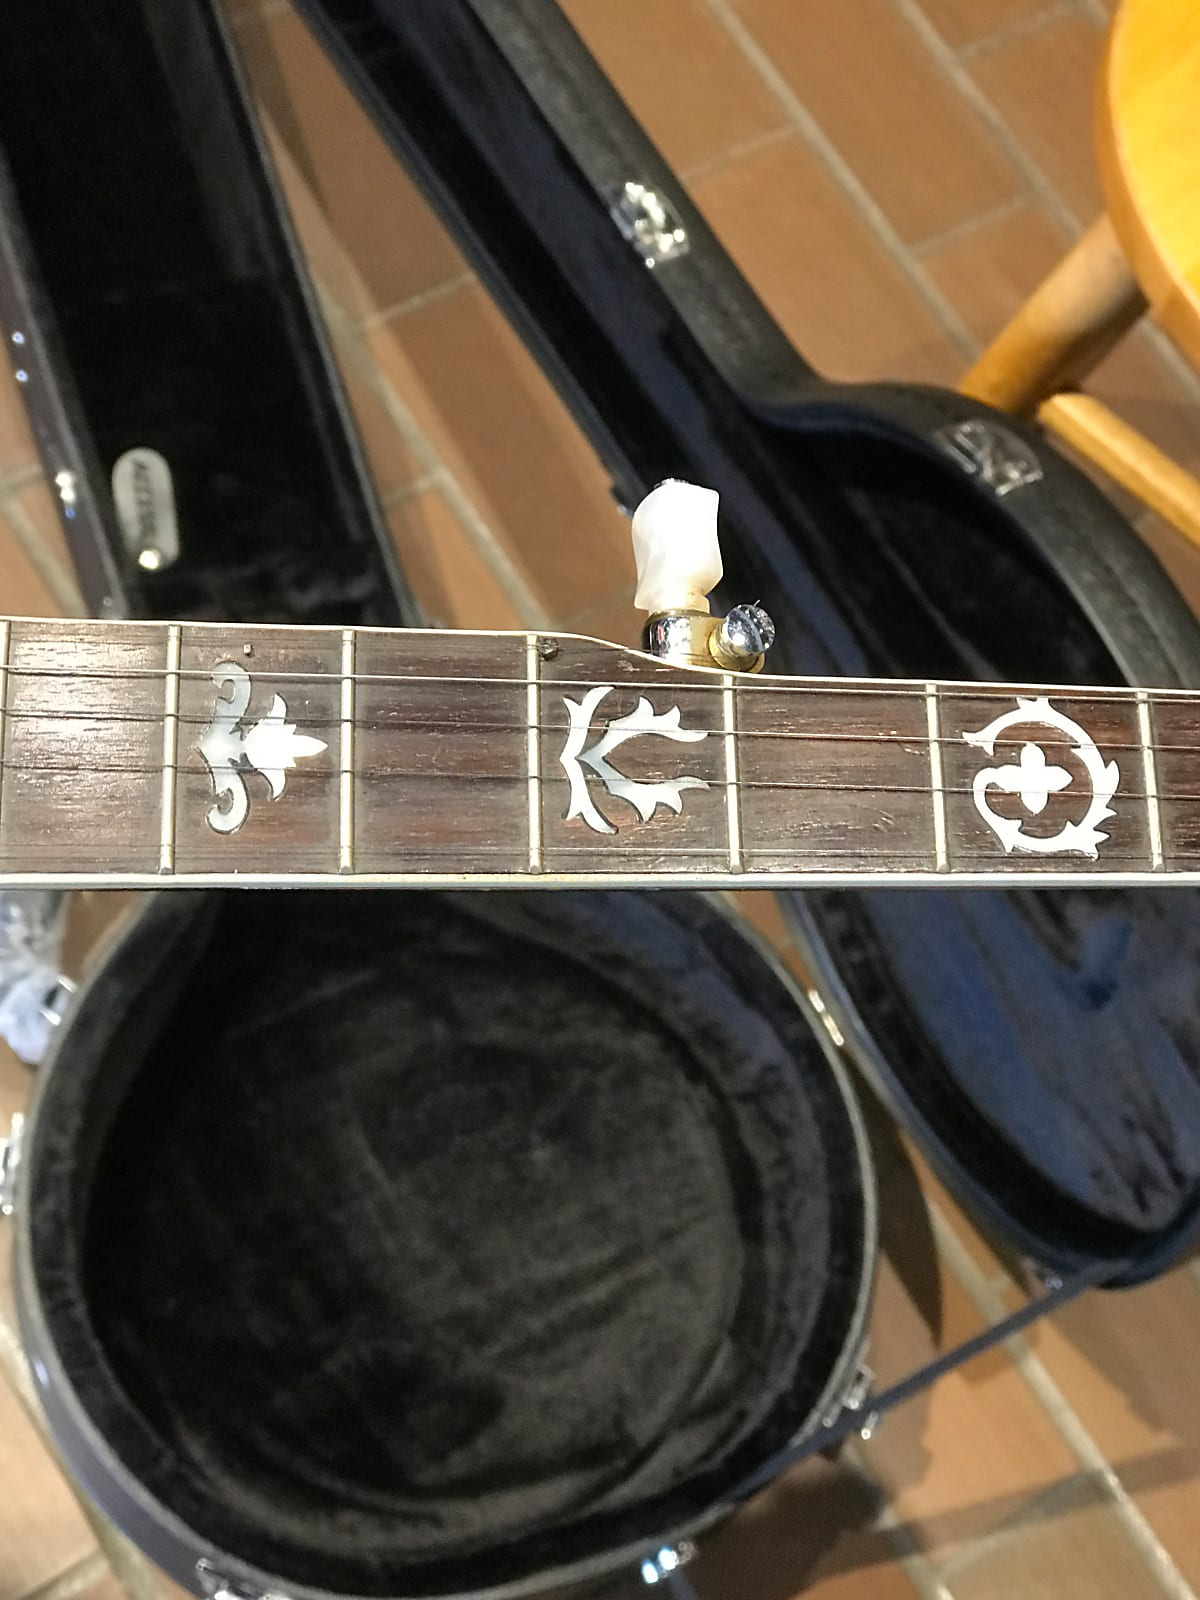 1980's Iida model 235 5 String Banjo with new hardshell case